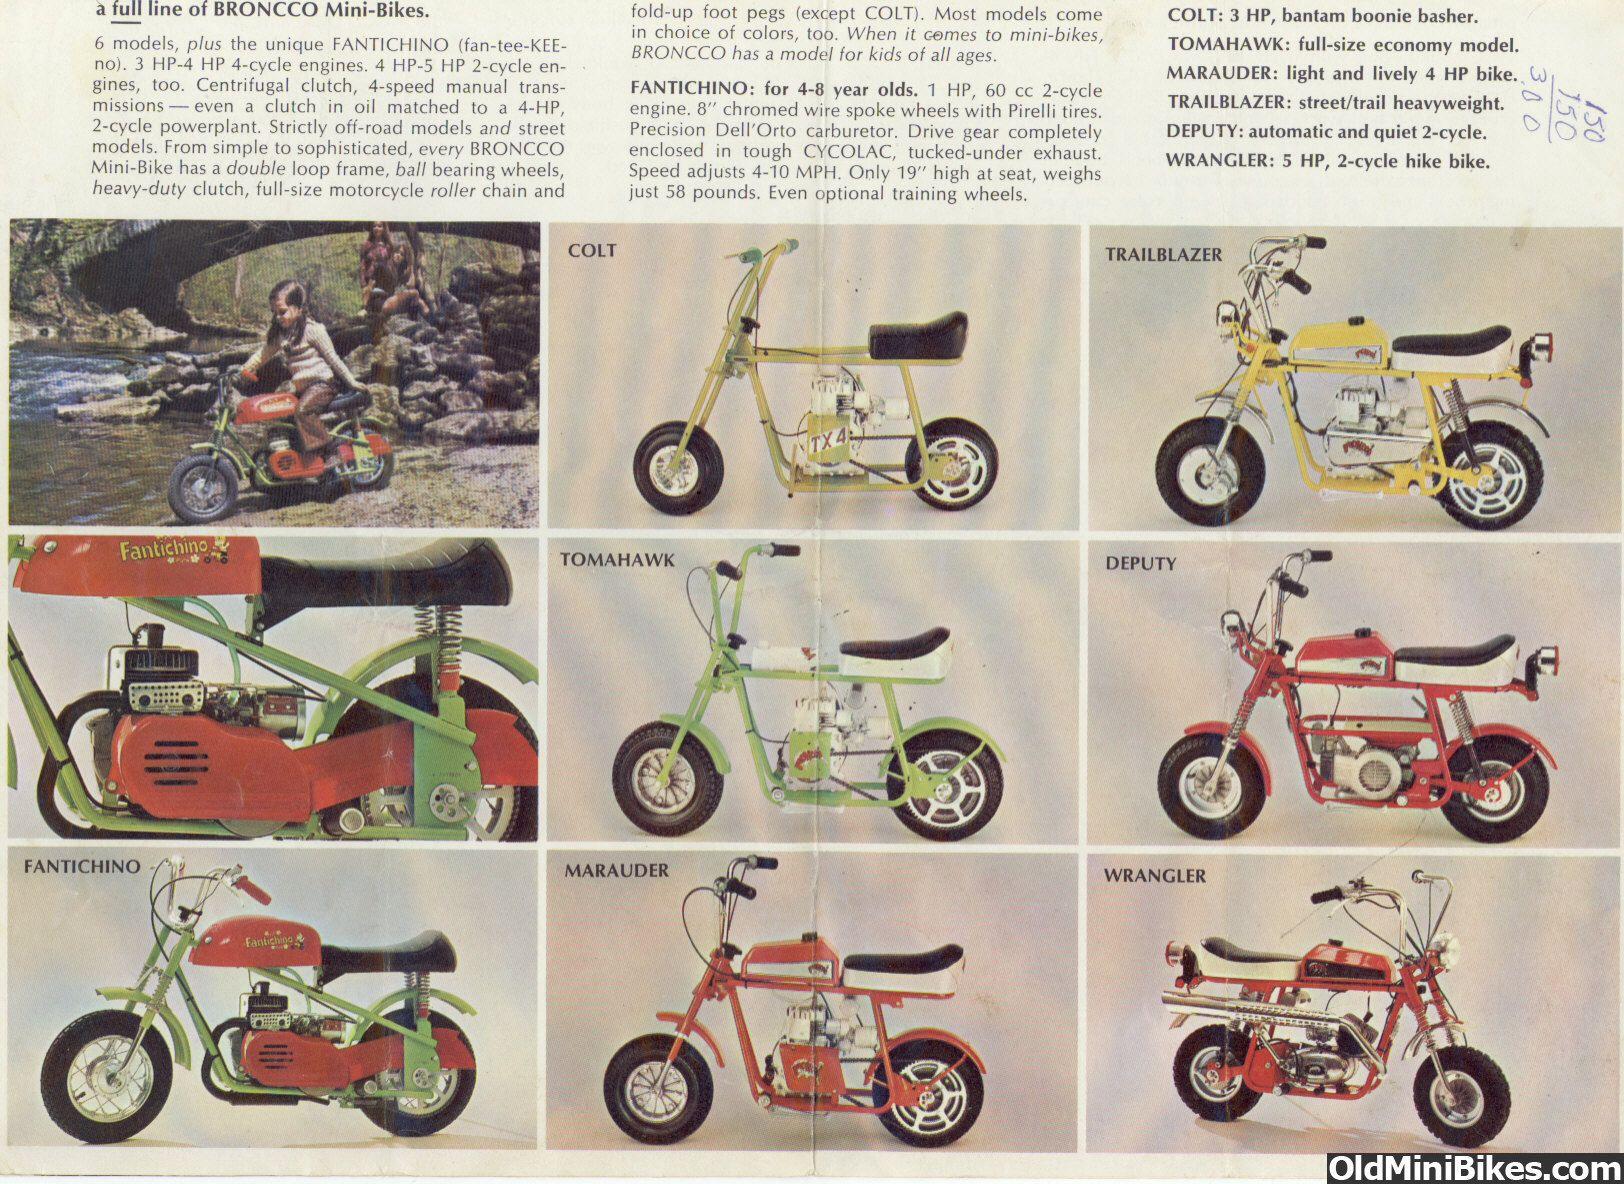 Broncco Mini Bikes Advertisement Mini Bike Bikes For Sale Bike